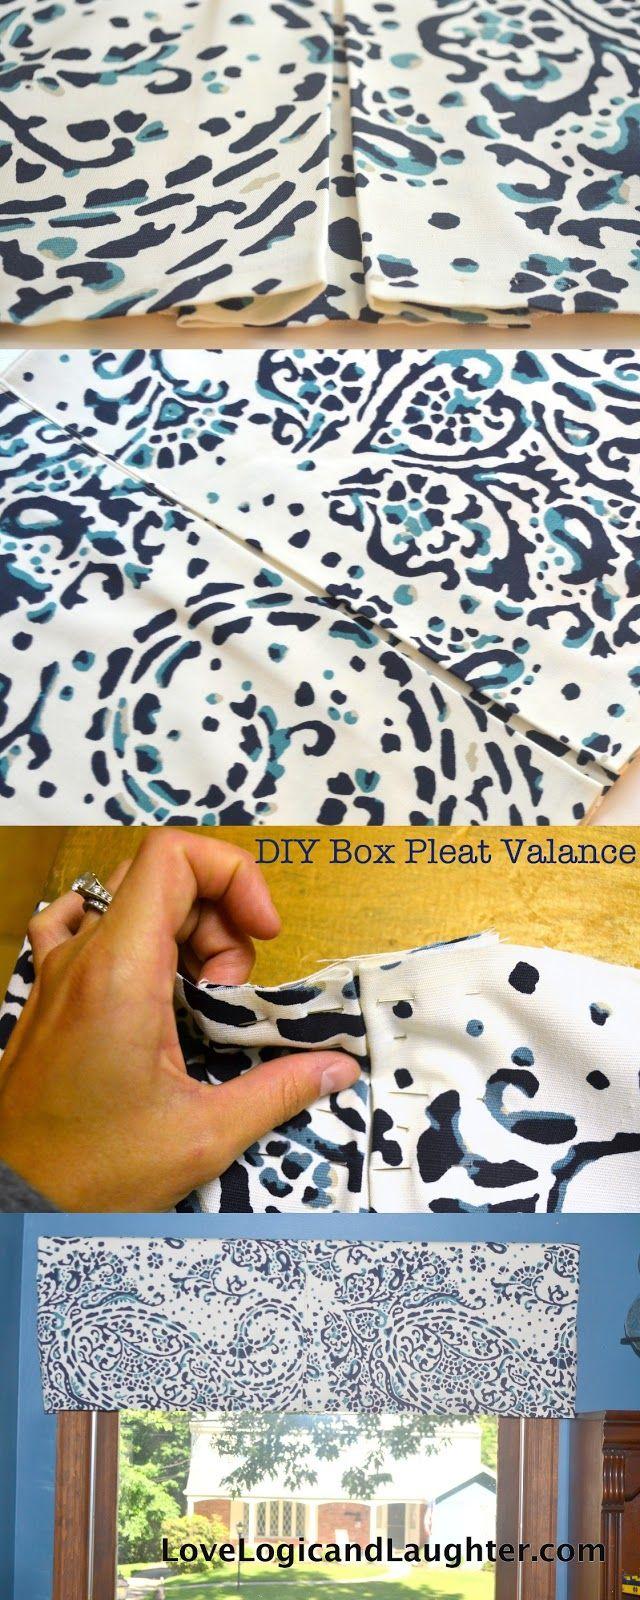 Logic and Laughter: Box Pleat Valance - DIY